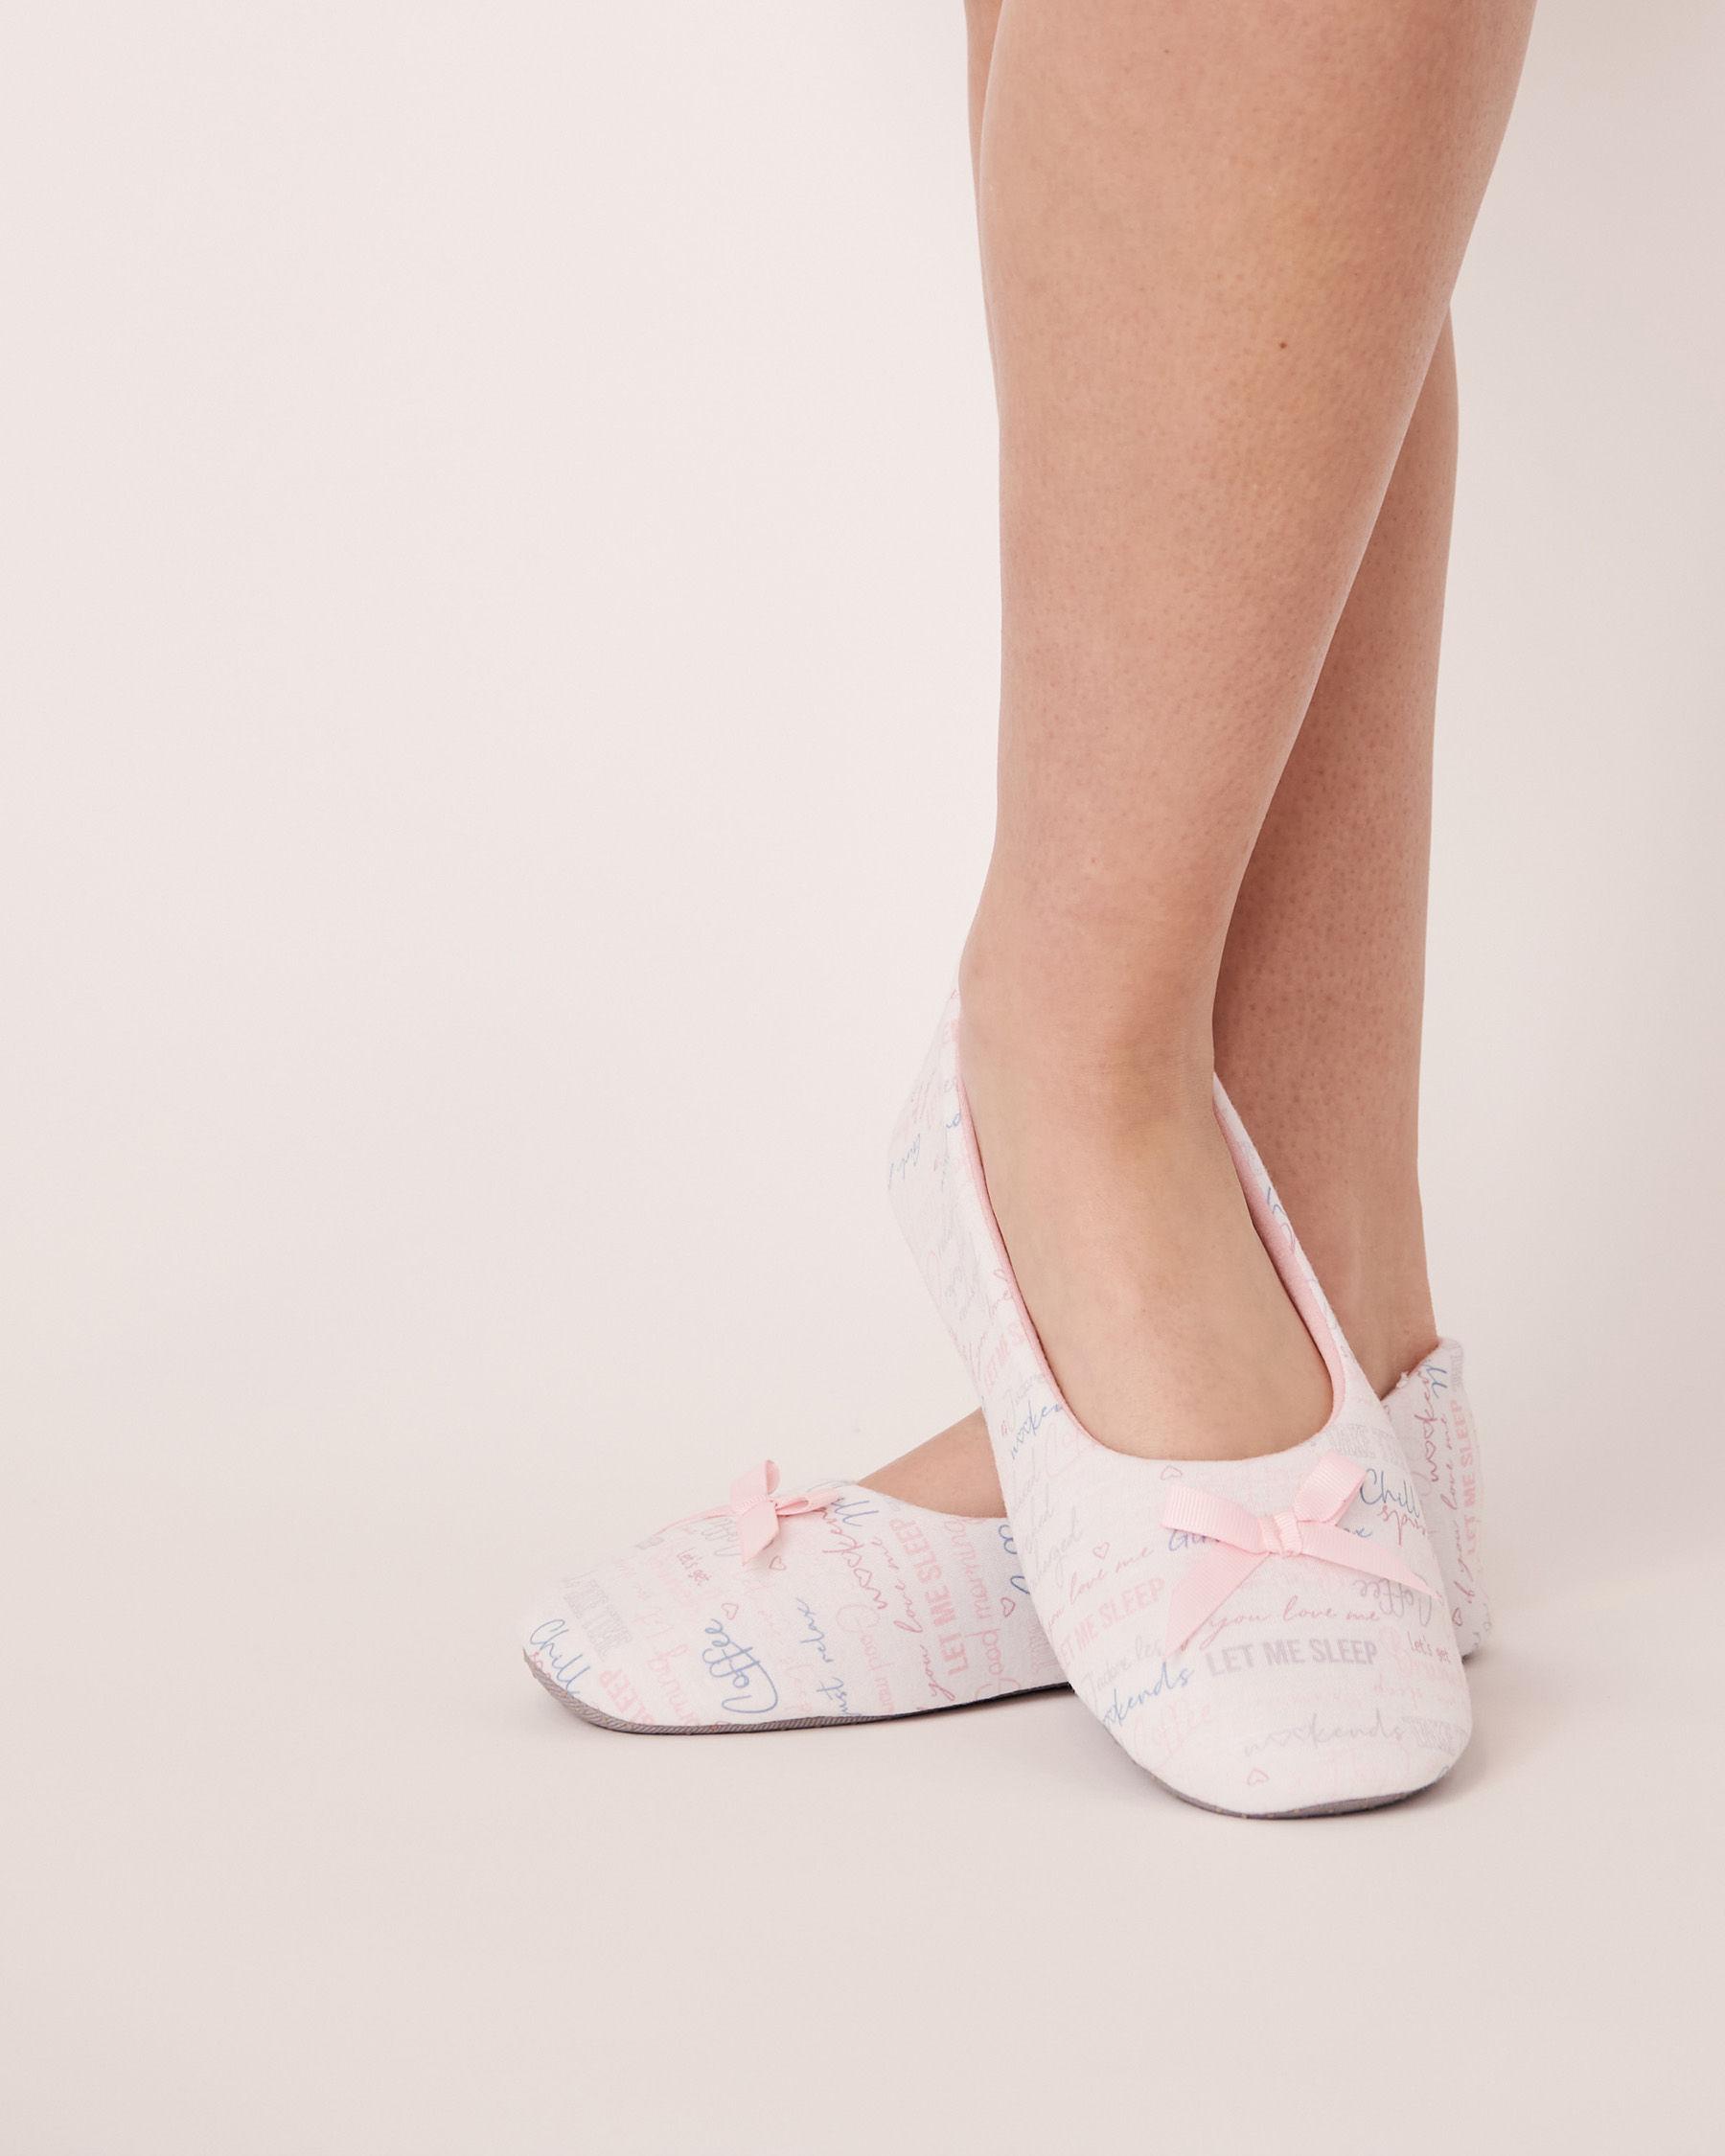 LA VIE EN ROSE Ballerina Slippers Words 40700052 - View3